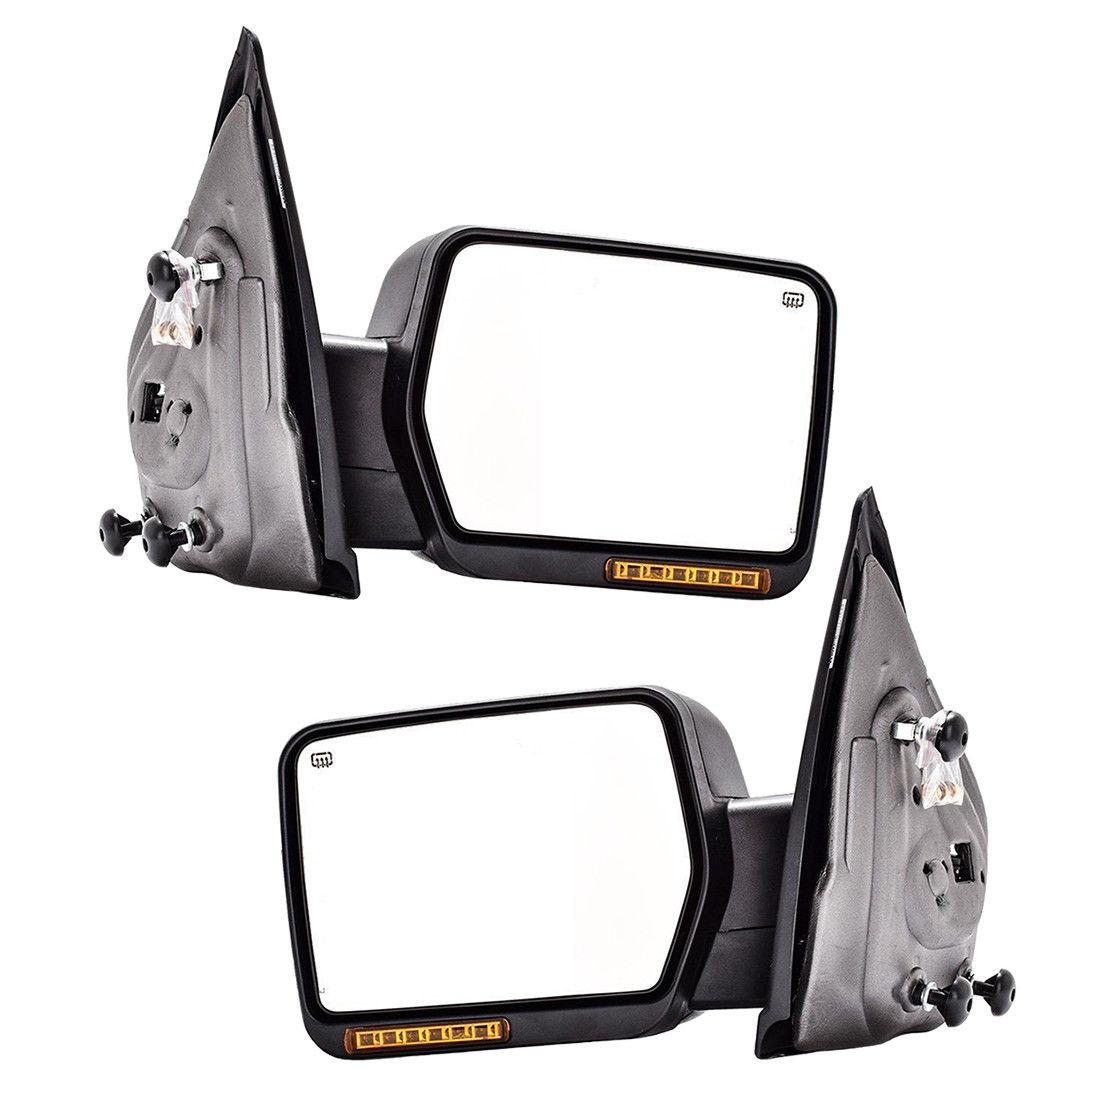 04-06 Driver Side Power Door Mirror Ford F-150 Light Duty